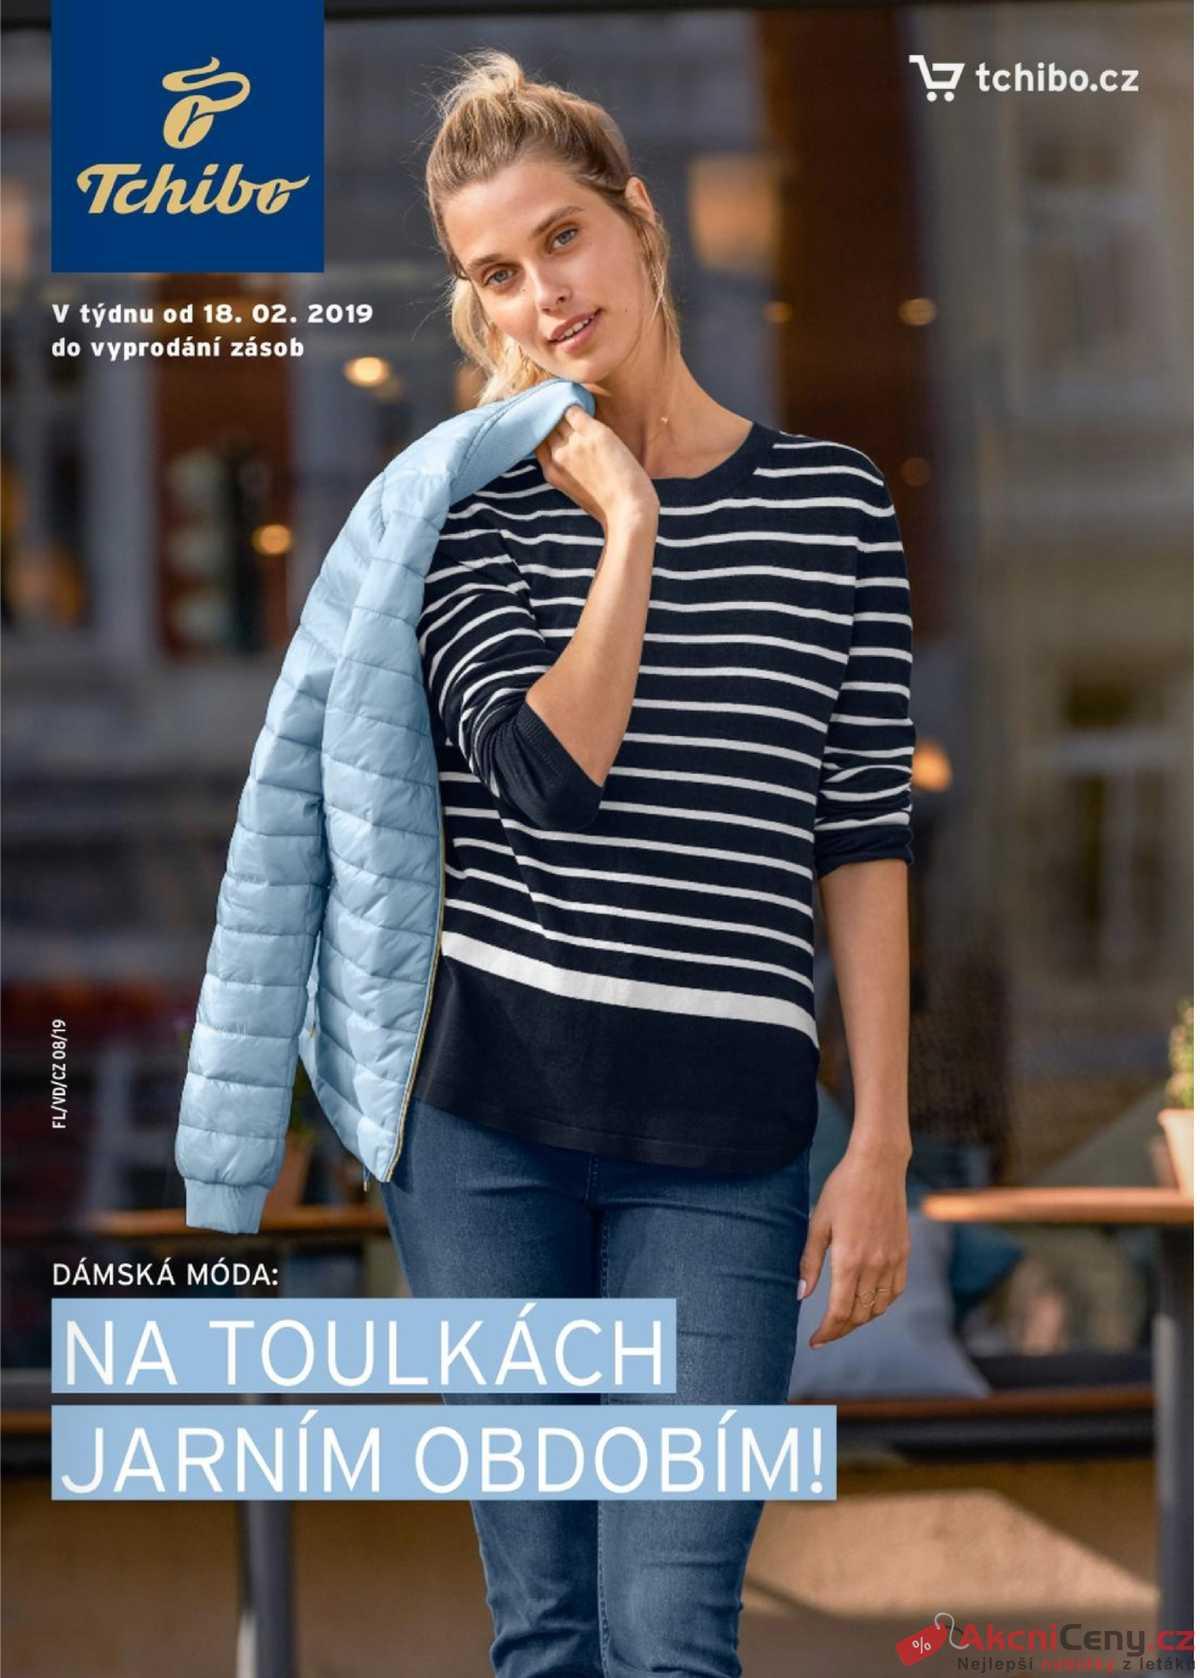 Leták Tchibo - Tchibo magazín 19.2. - 2.4. - strana 1 8b4e37c210